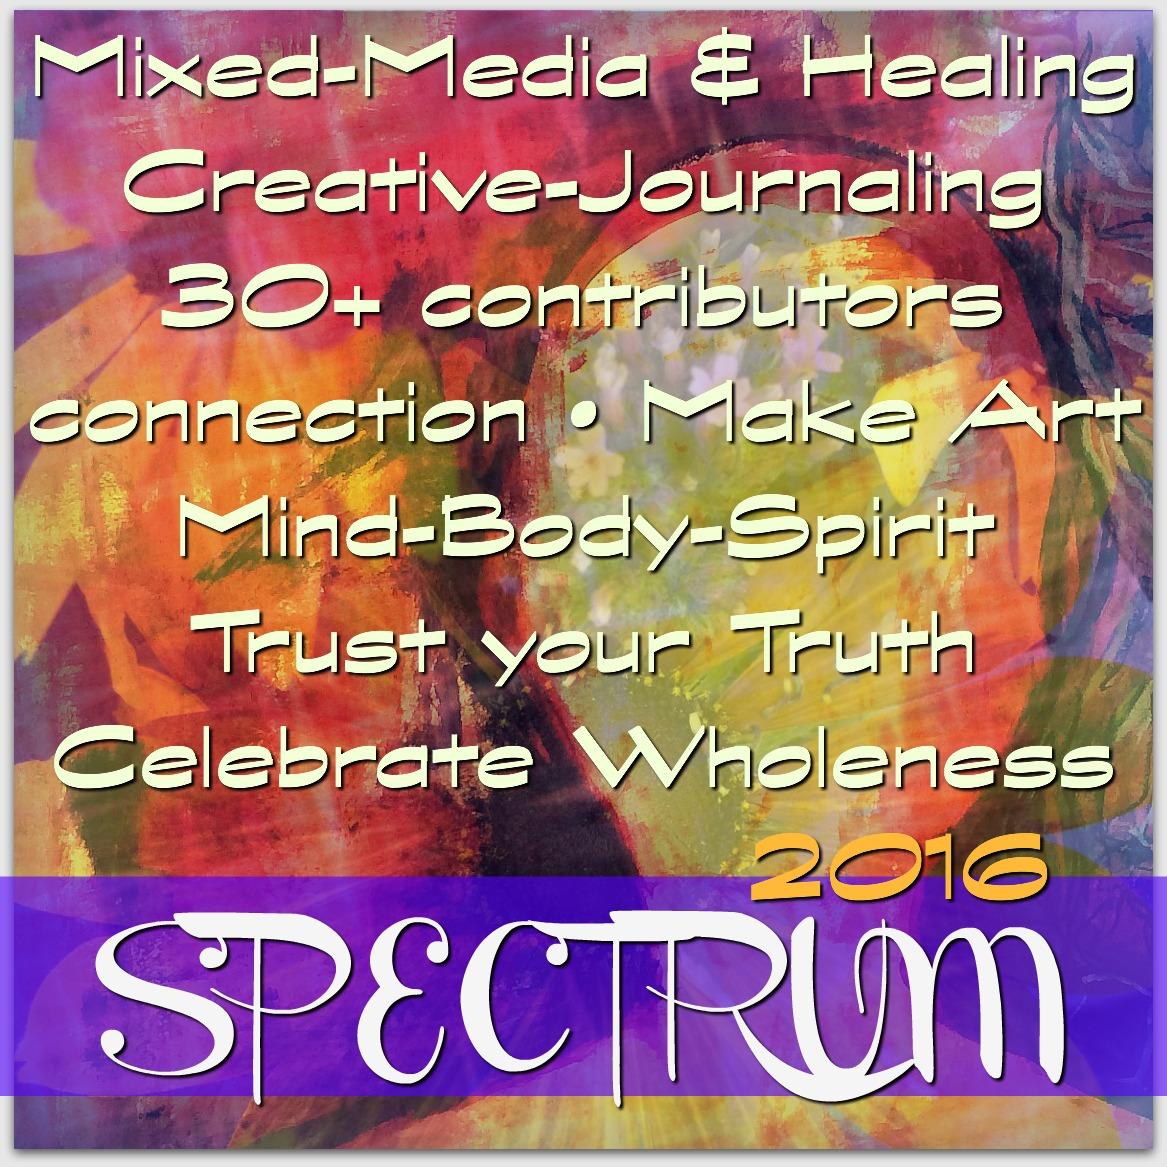 Spectrum 2016 Holistic Creative Workshop, join us